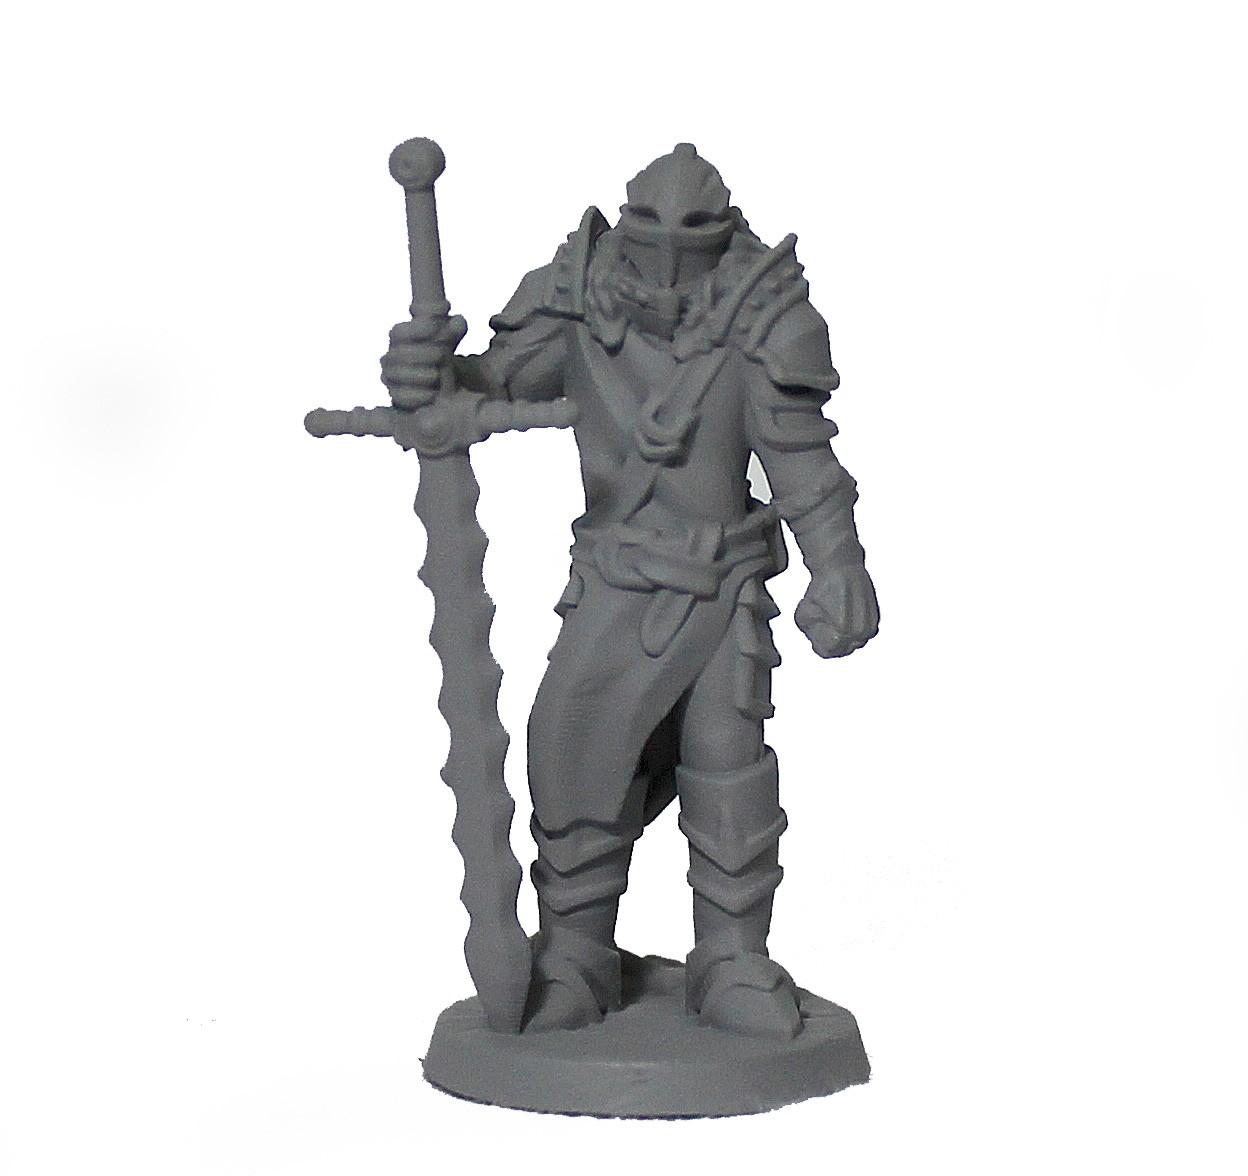 Cavaleiro miniatura RPG Boargame Hobby pintura - guerreiro M4